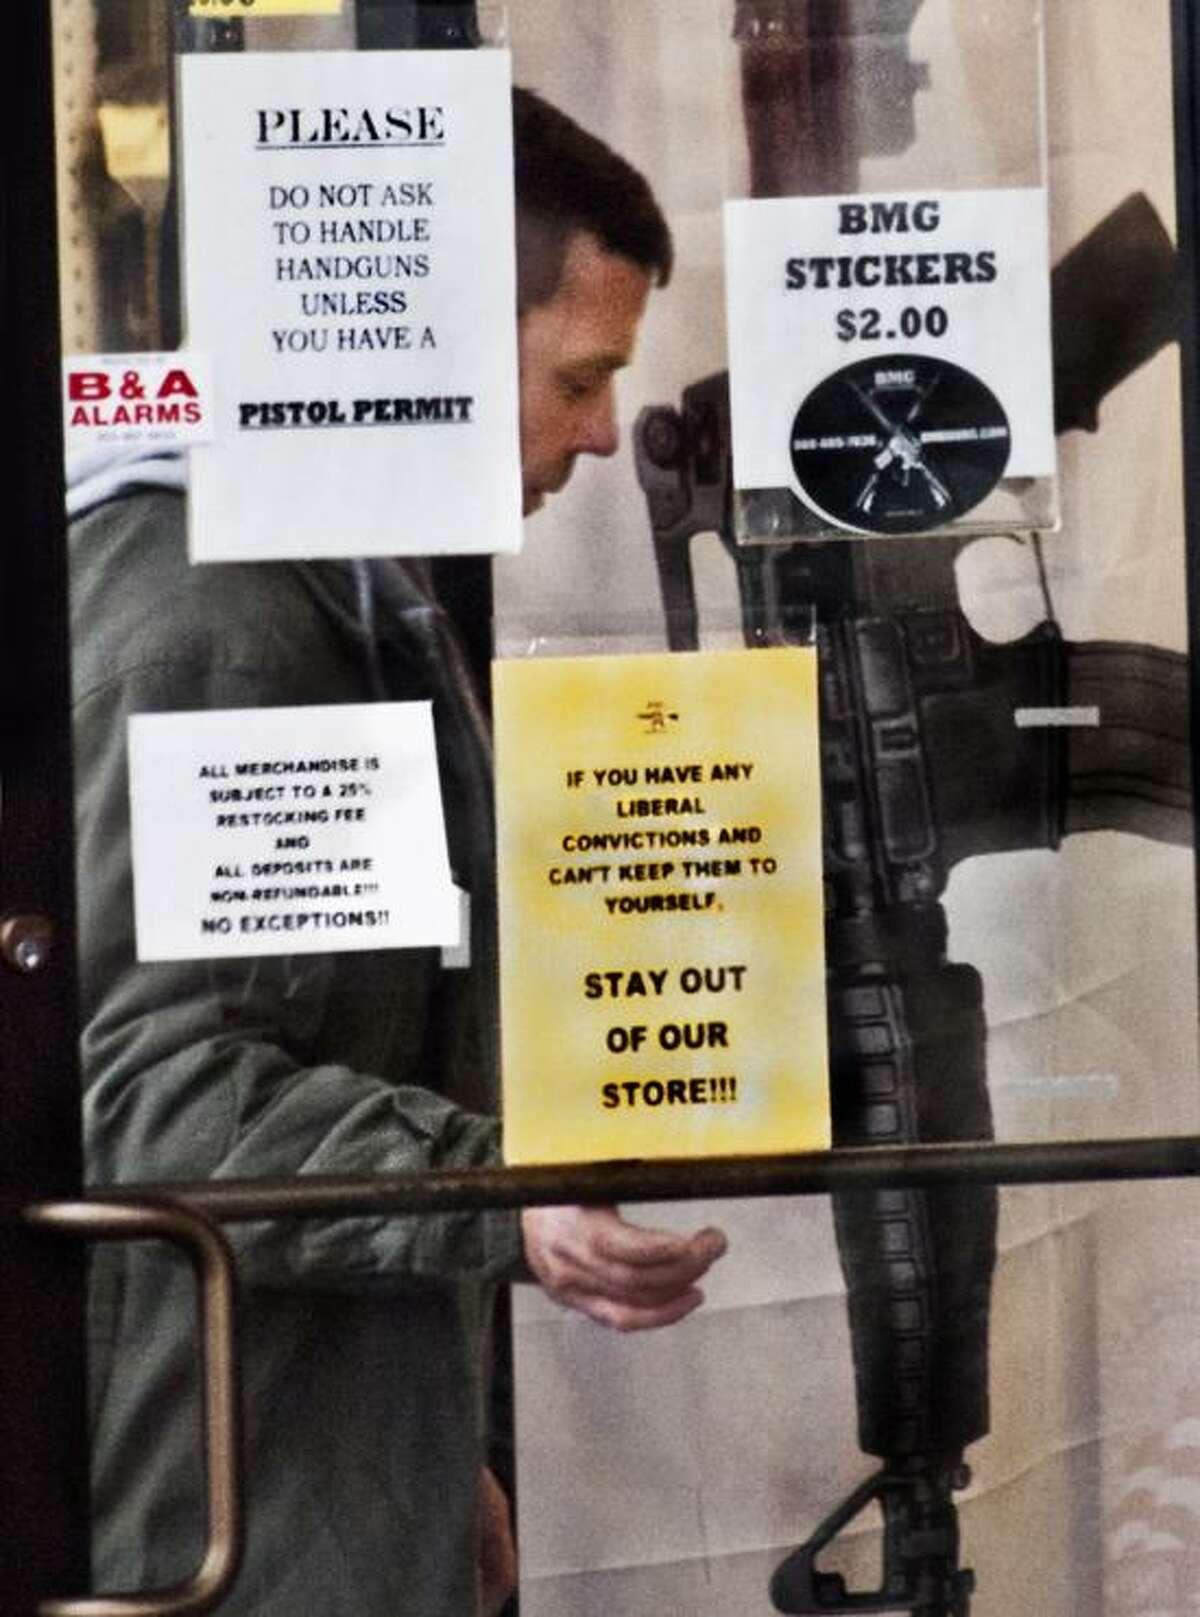 A man walks into BMG gun shop, in Newington. Melanie Stengel/Register